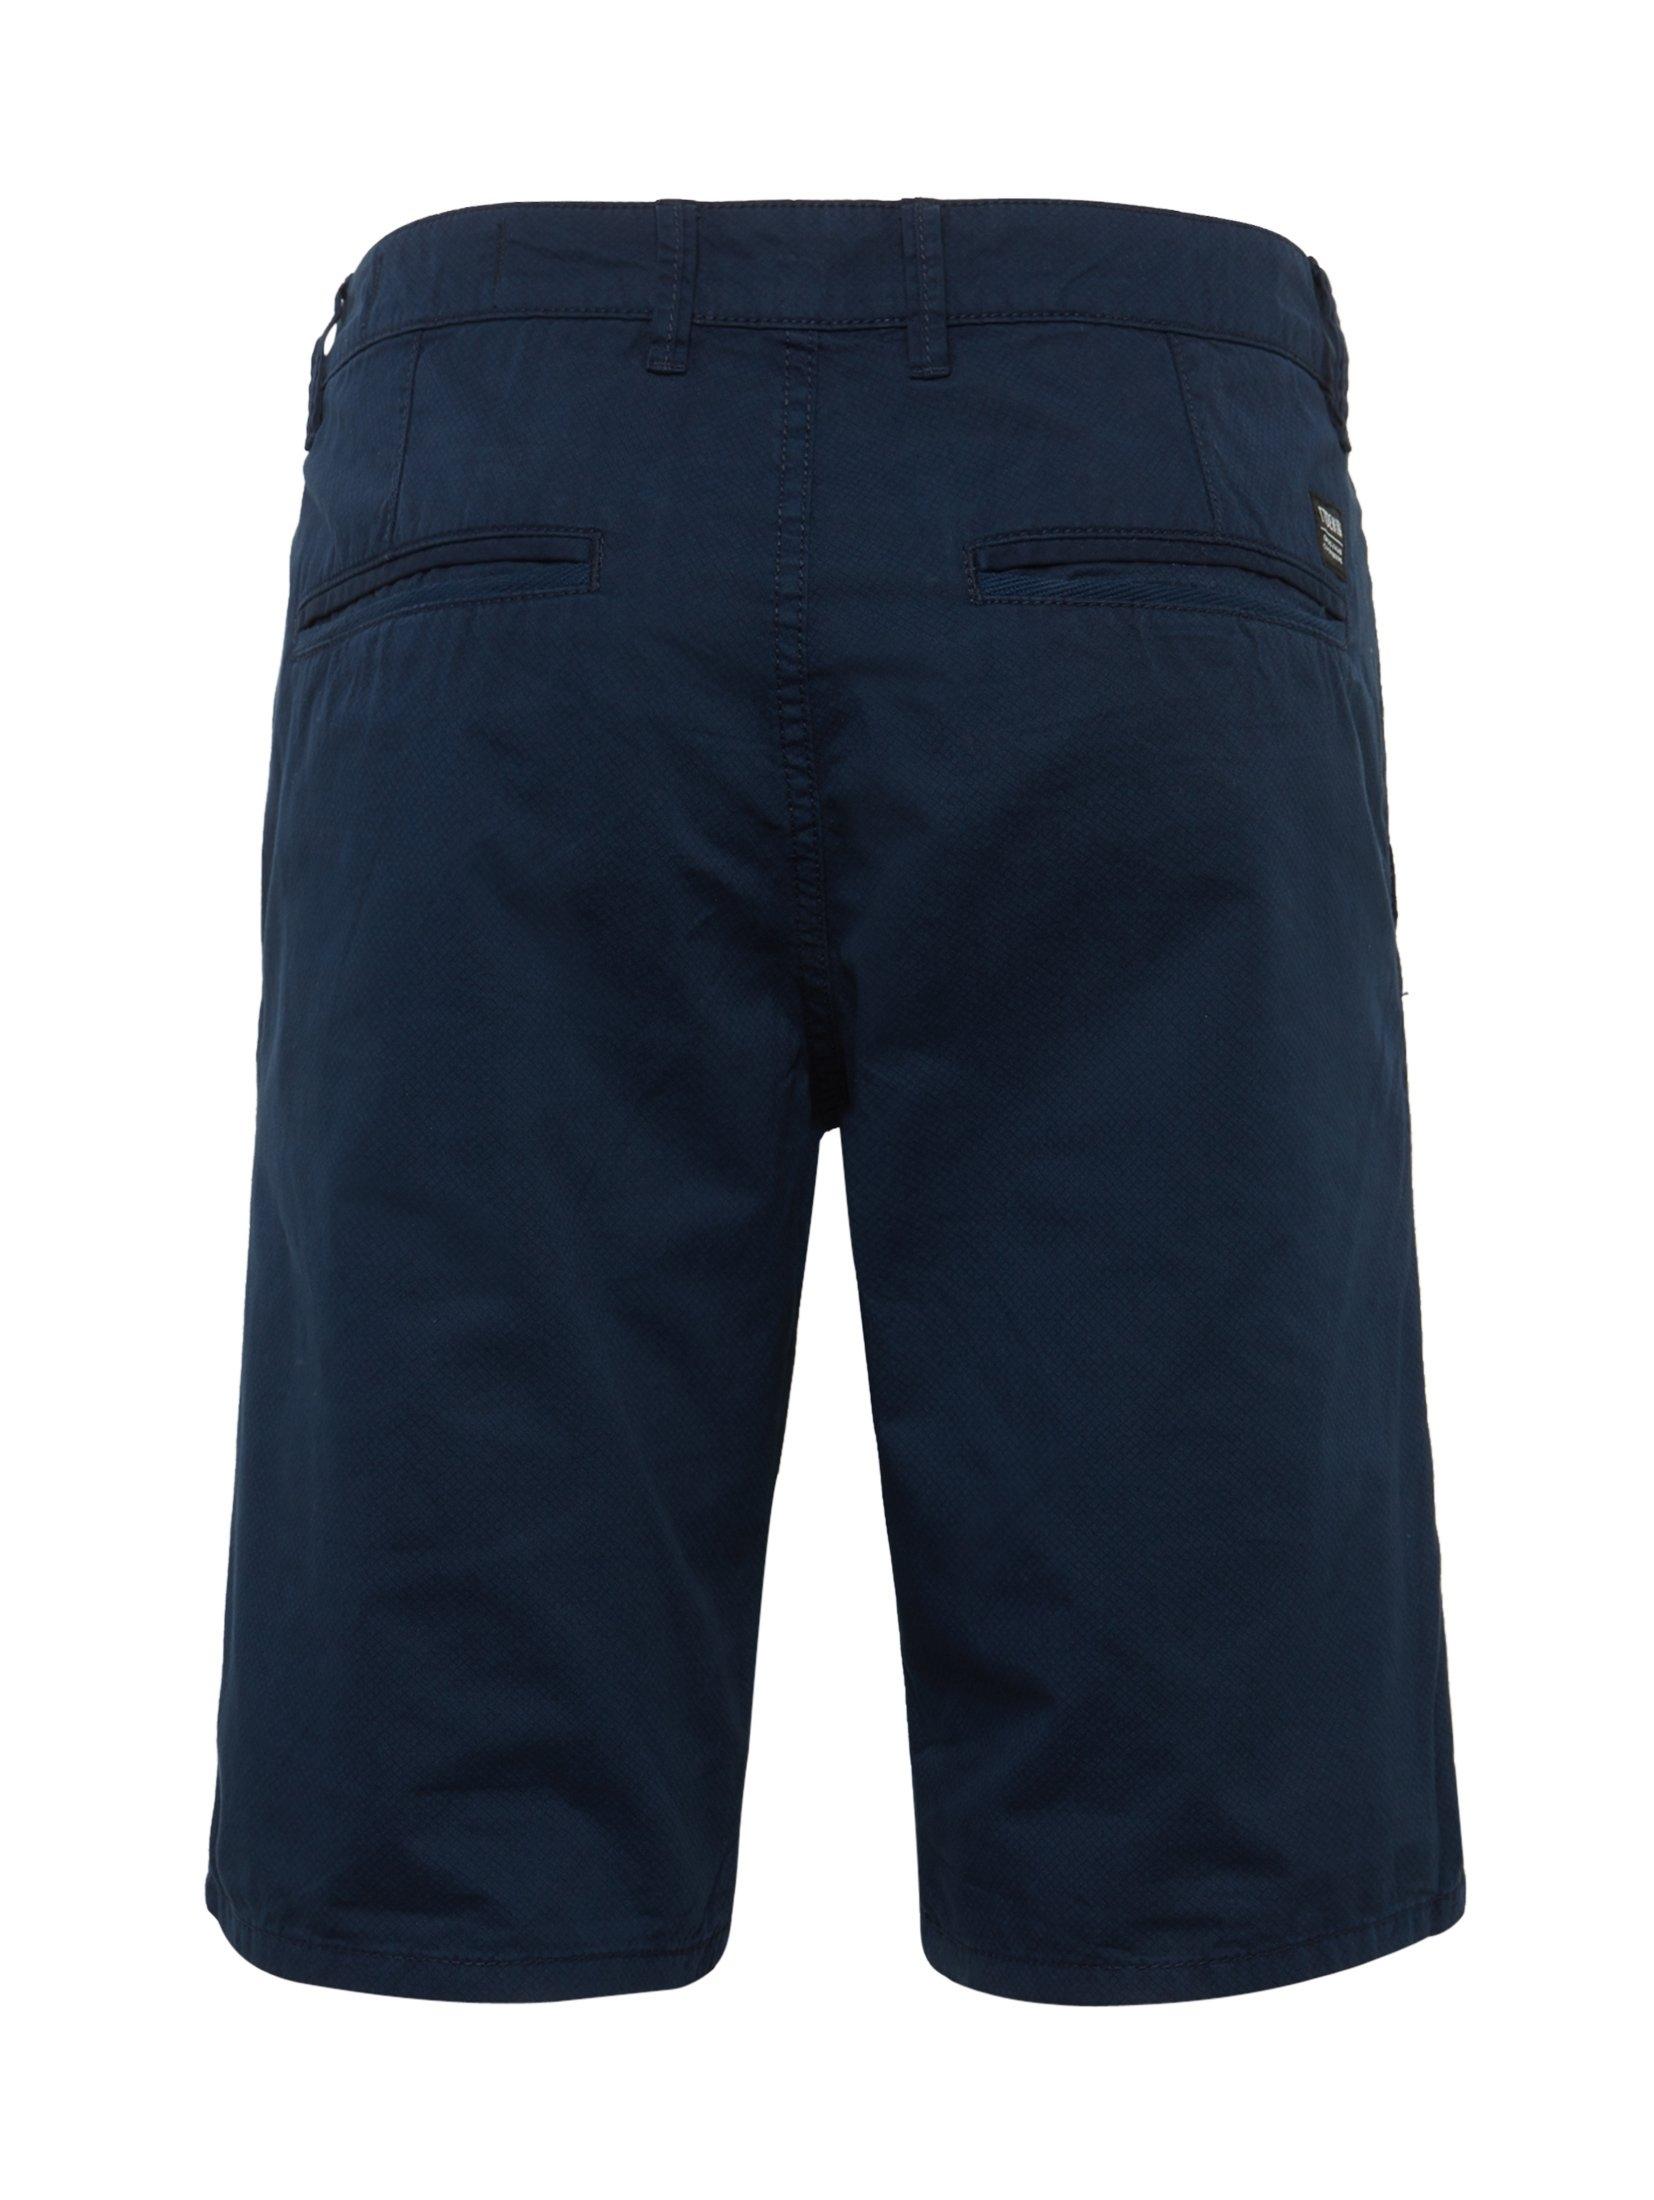 Slim Shorts Online Tom Denim Bermudachino Verkrijgbaar Tailor YymIbf6gv7